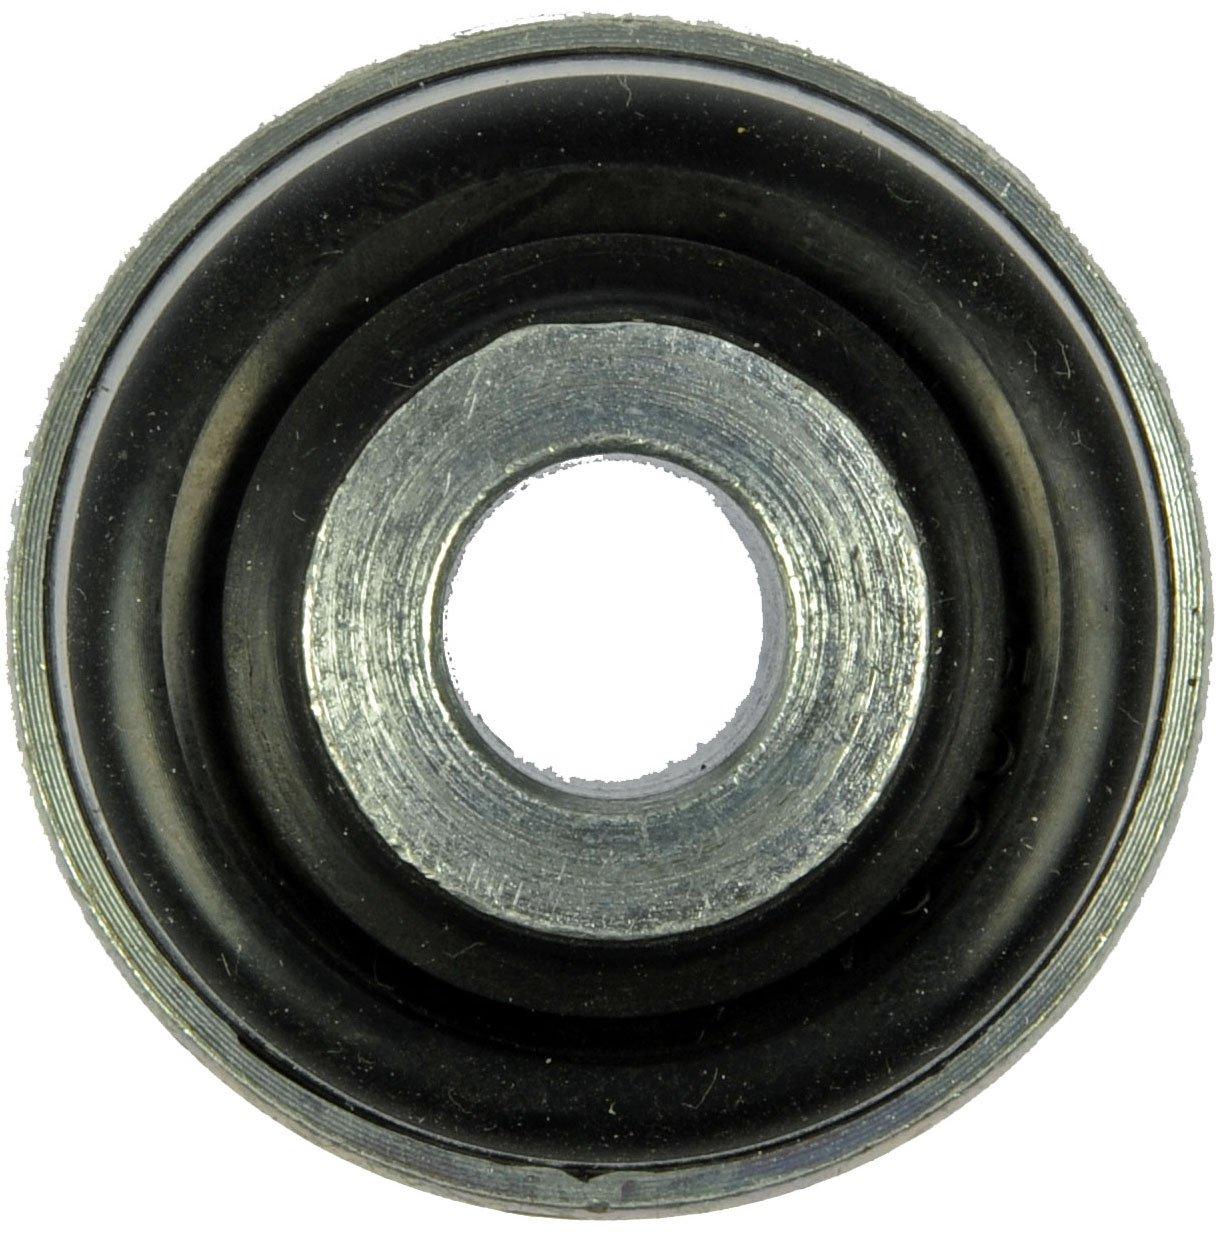 Dorman 905-520 Rear Suspension Knuckle Bushing